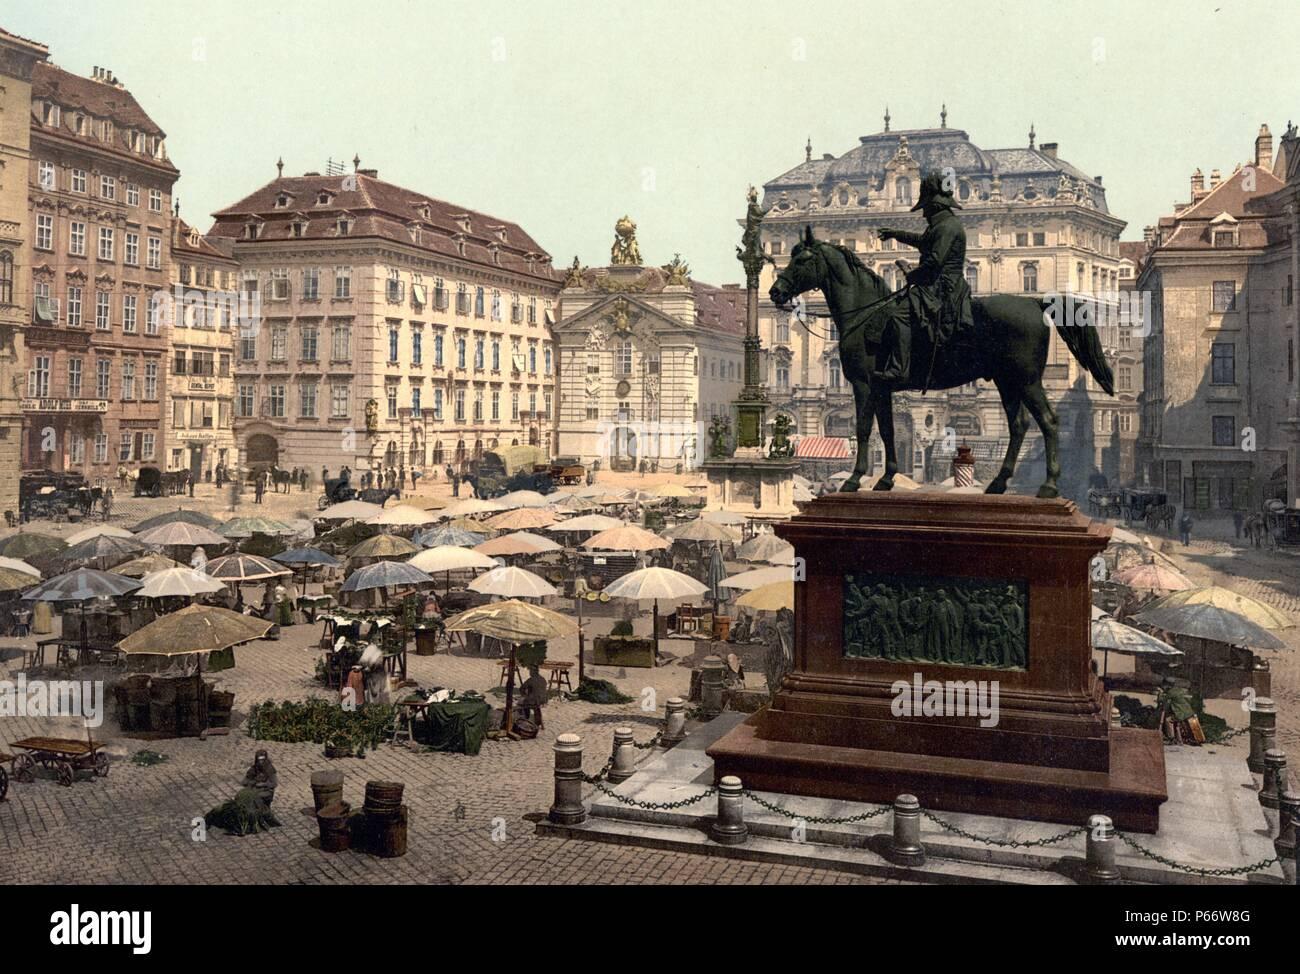 Market place, Vienna, Austro-Hungary 1901 - Stock Image